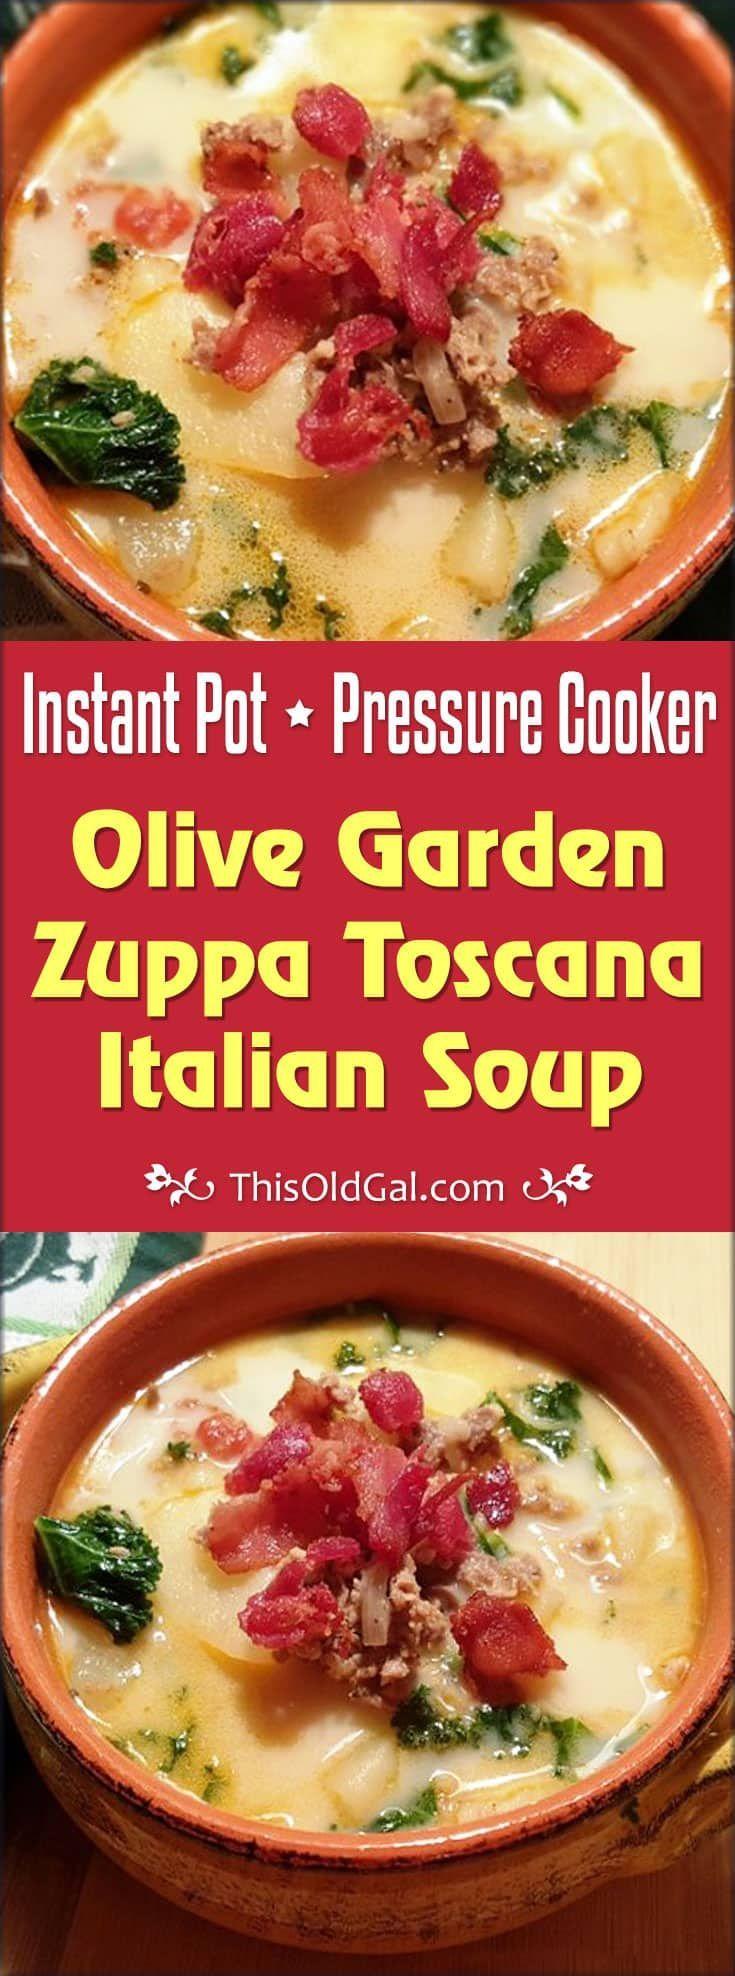 Instant Pot Olive Garden Zuppa Toscana Italian Soup